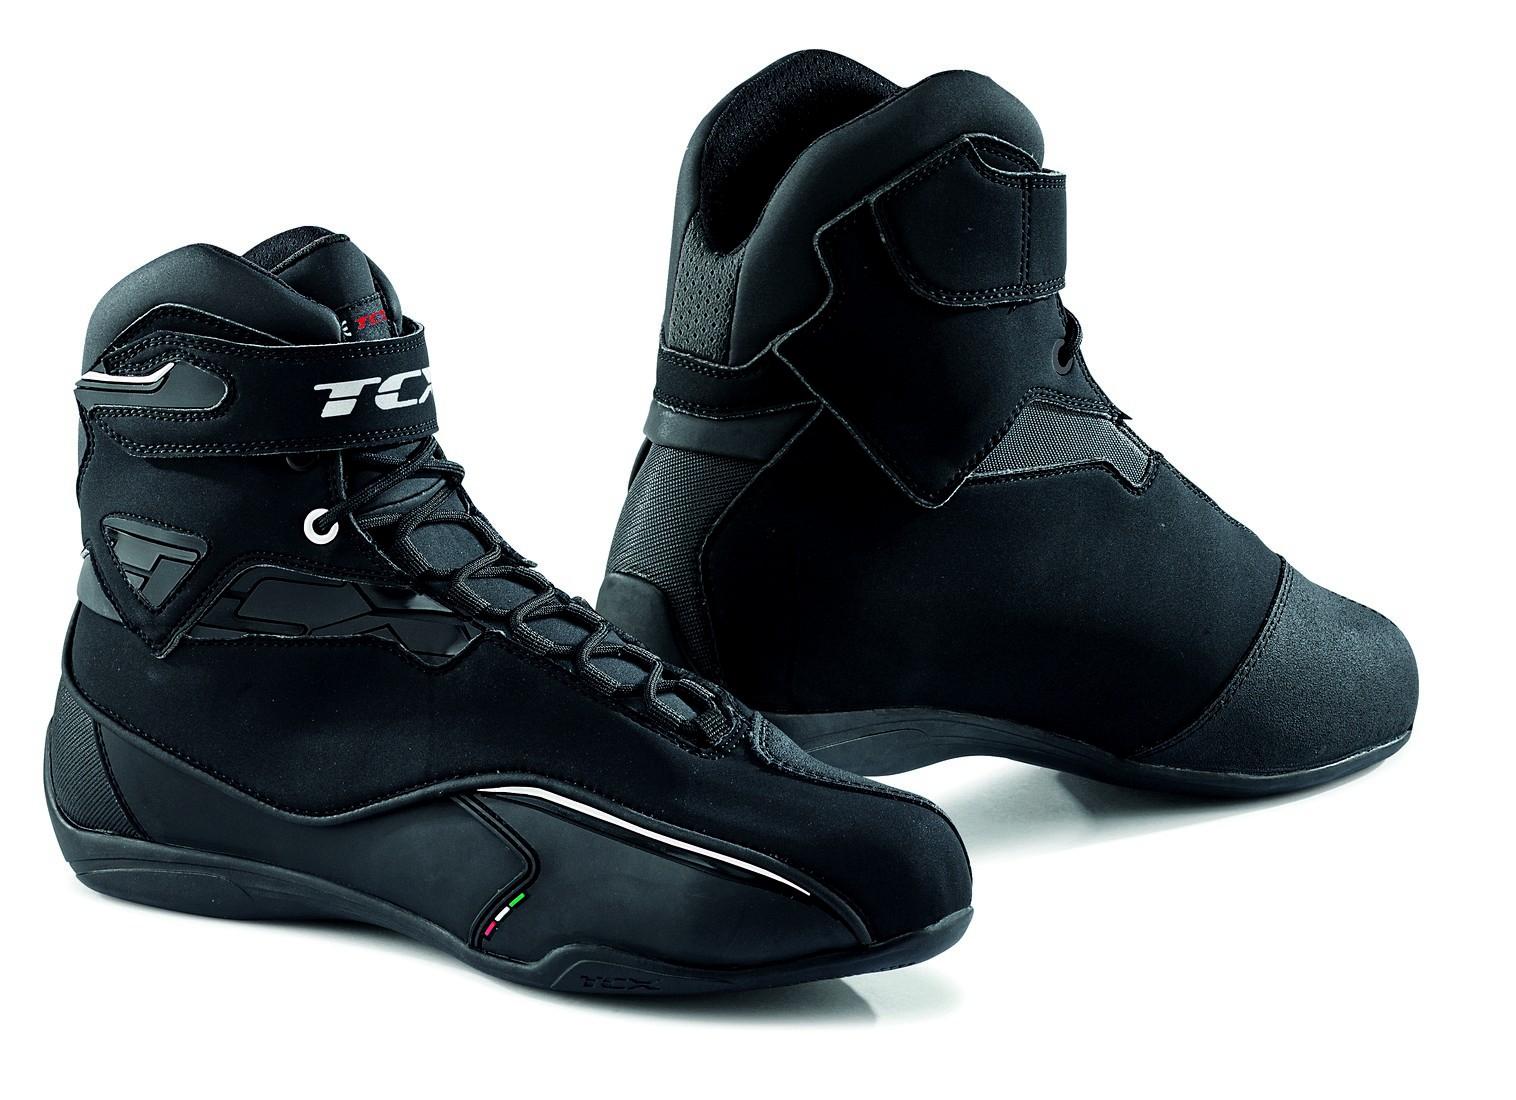 BATAI TCX ZETA WP (BLACK)